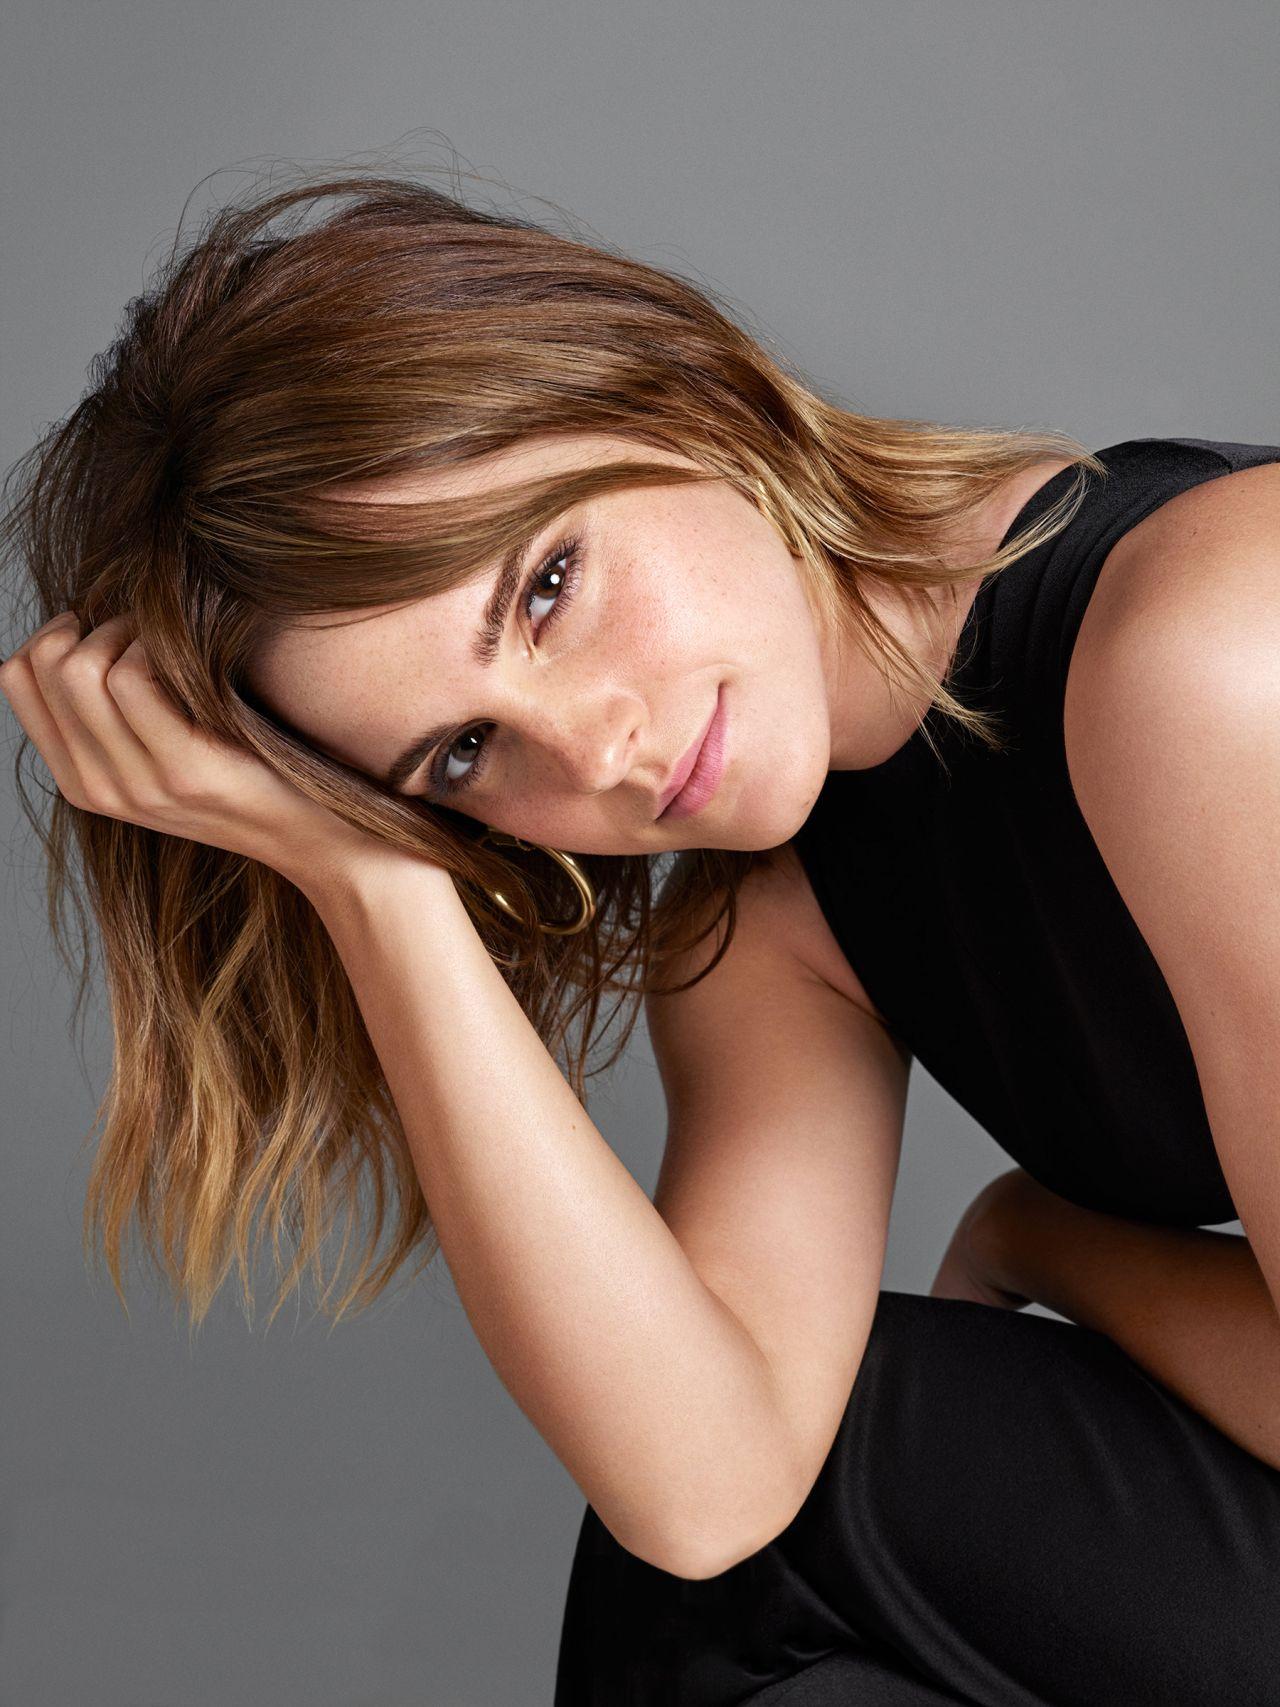 Emma Watson Photoshoot February 2017